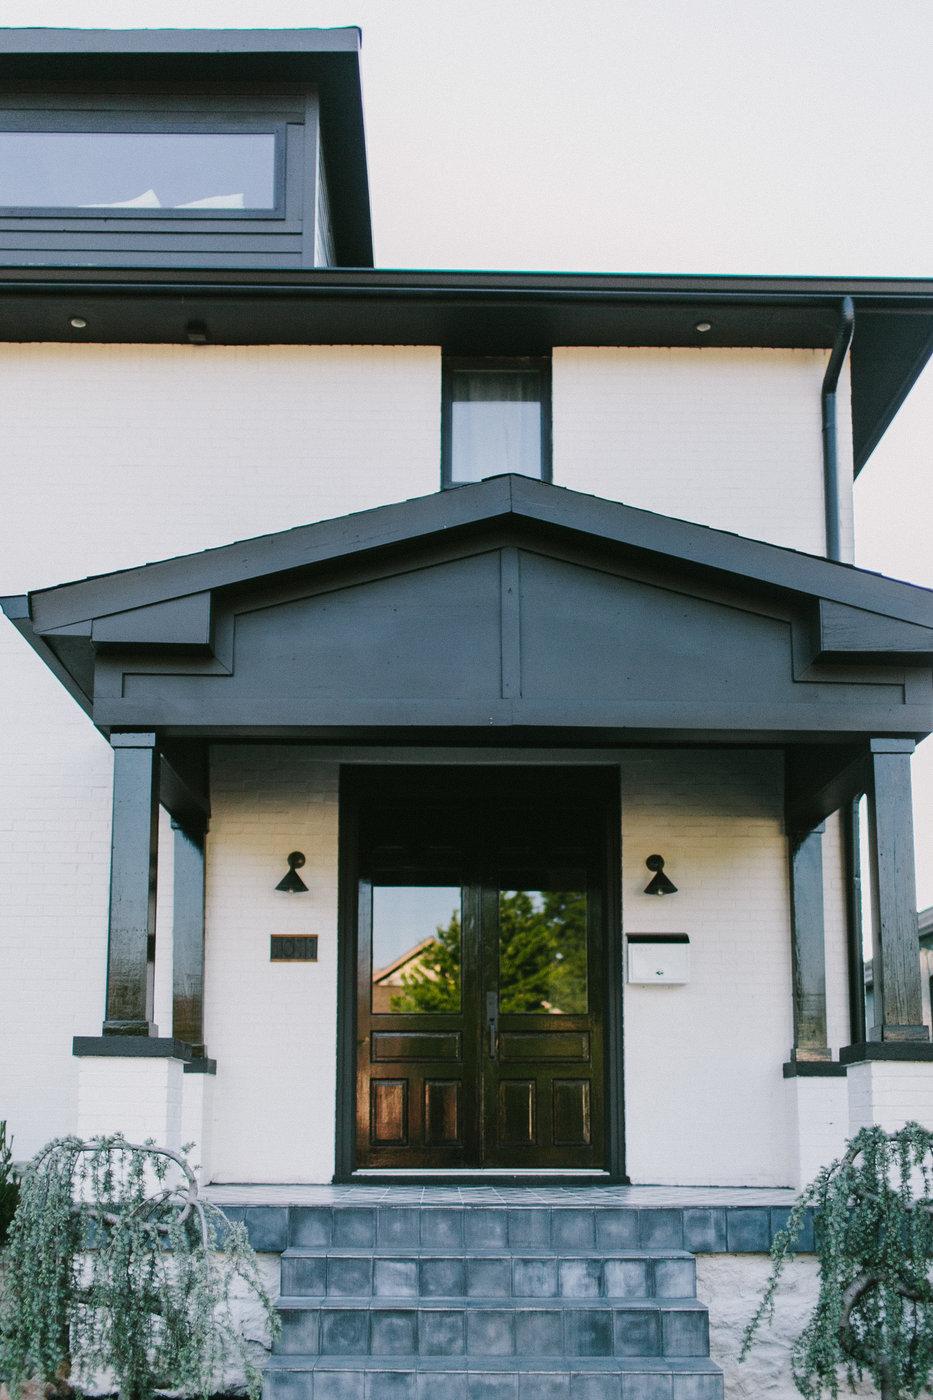 martin house-martin house-0217.jpg